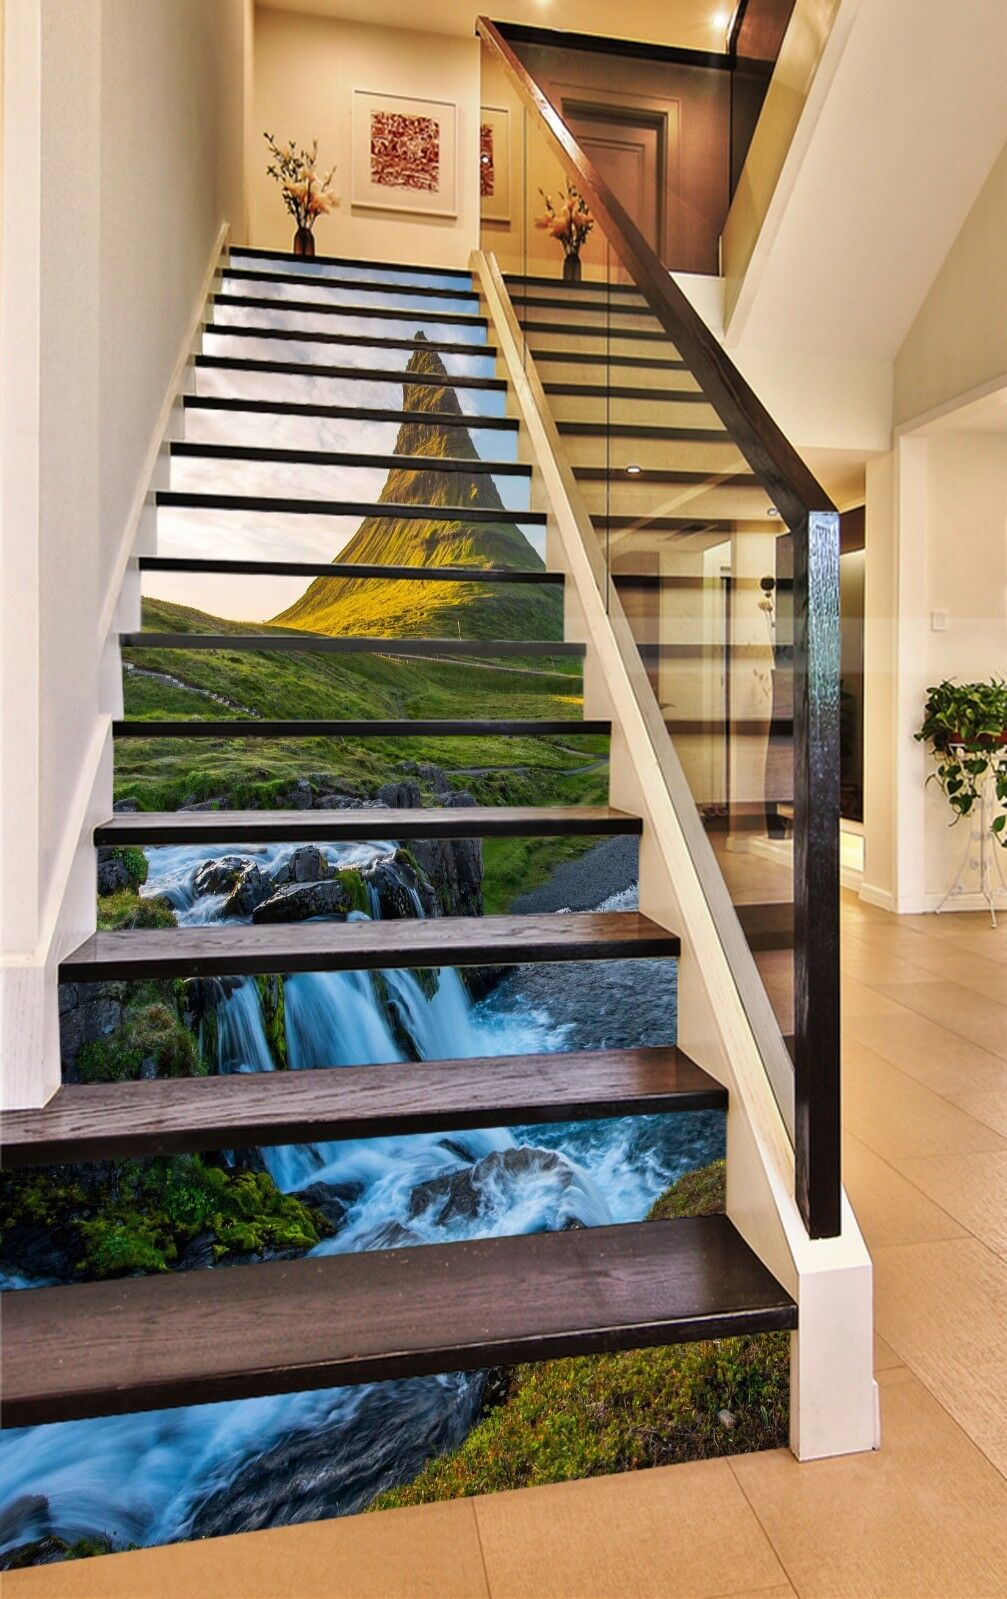 3D Mountain Peak 89 Stair Risers Decoration Photo Mural Vinyl Decal Wallpaper AU